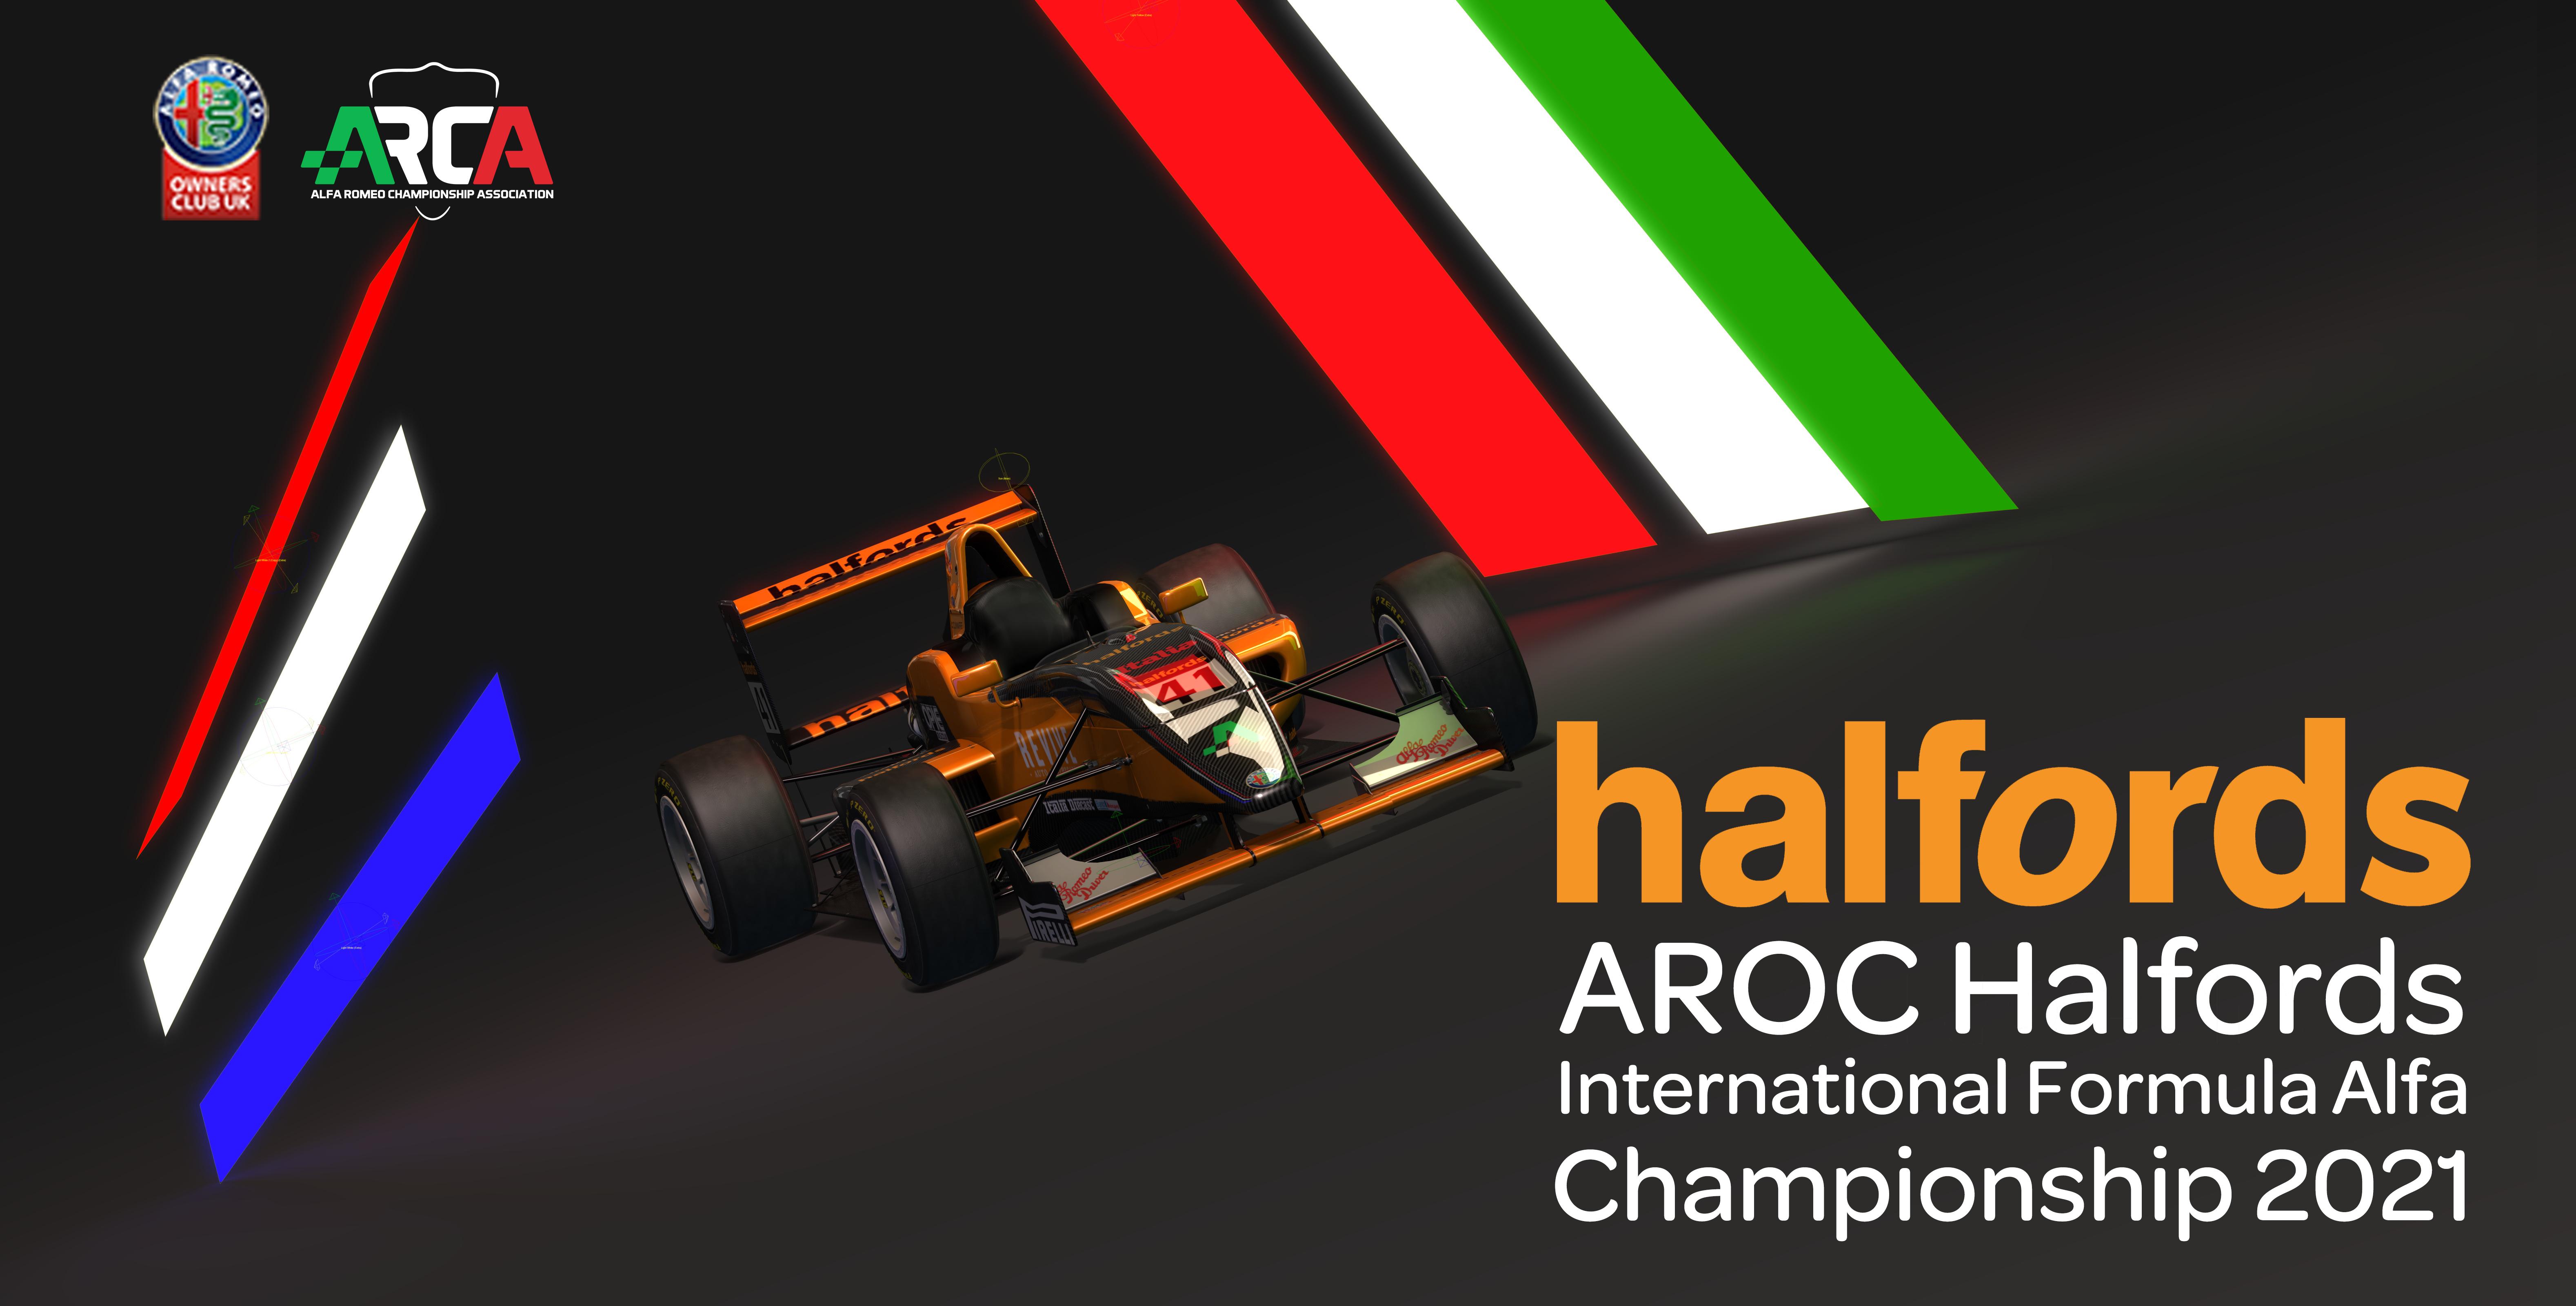 AROC Halfords International Formula Alfa Championship-image